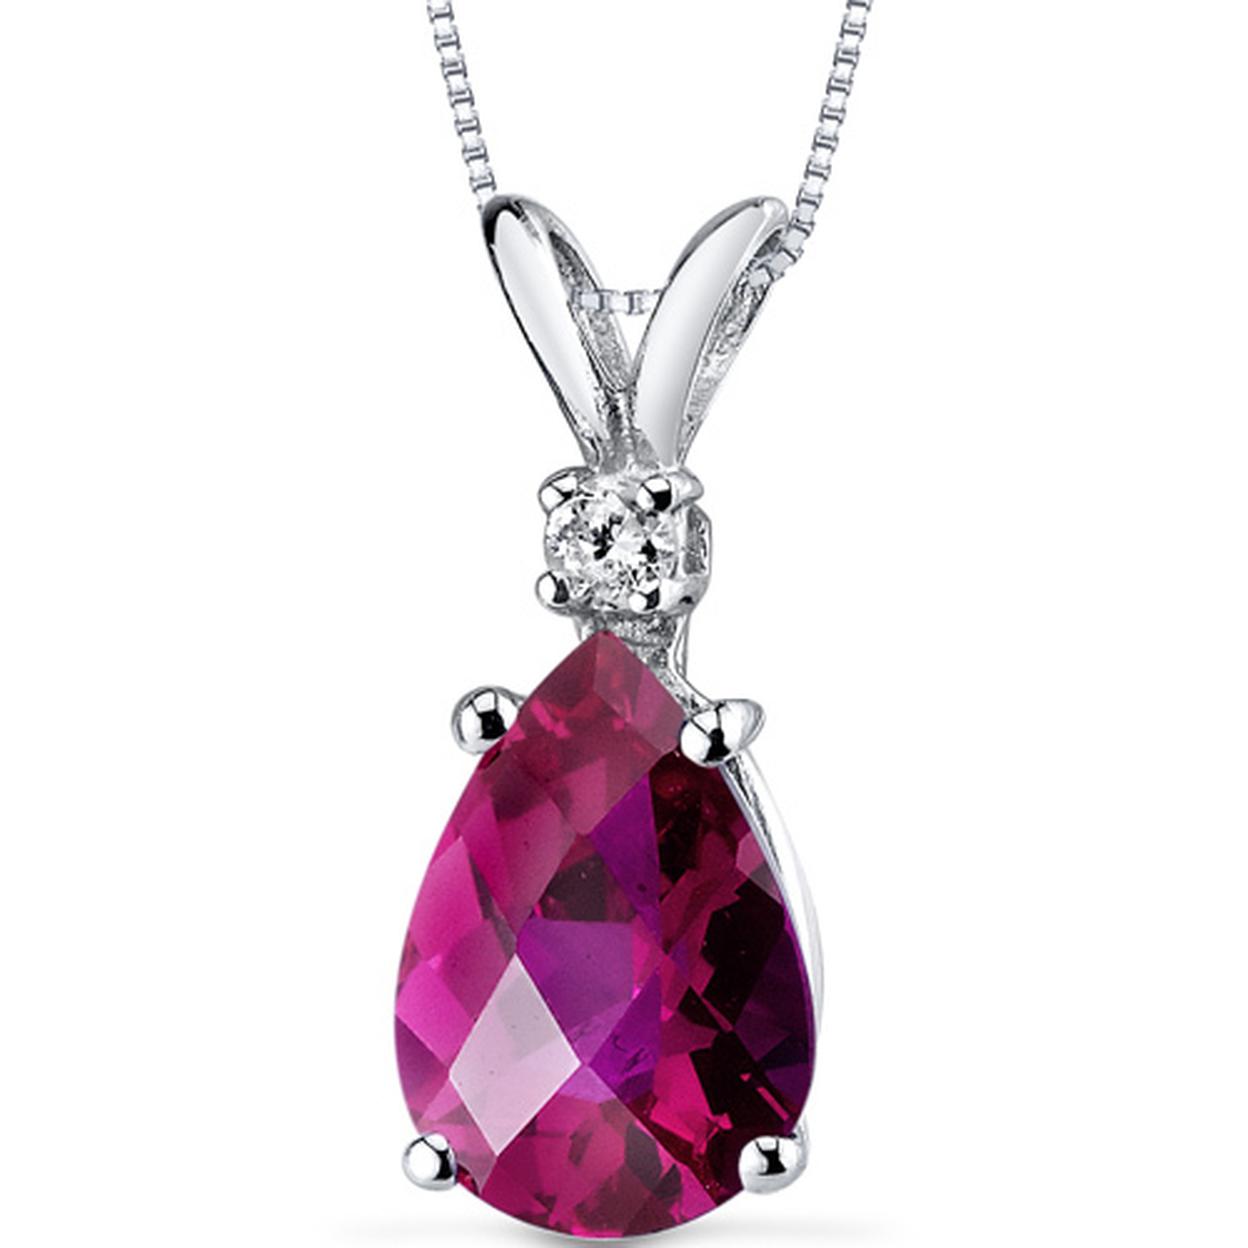 14 Karat White Gold Pear Shape 2.50 Carats Created Ruby Diamond Pendant